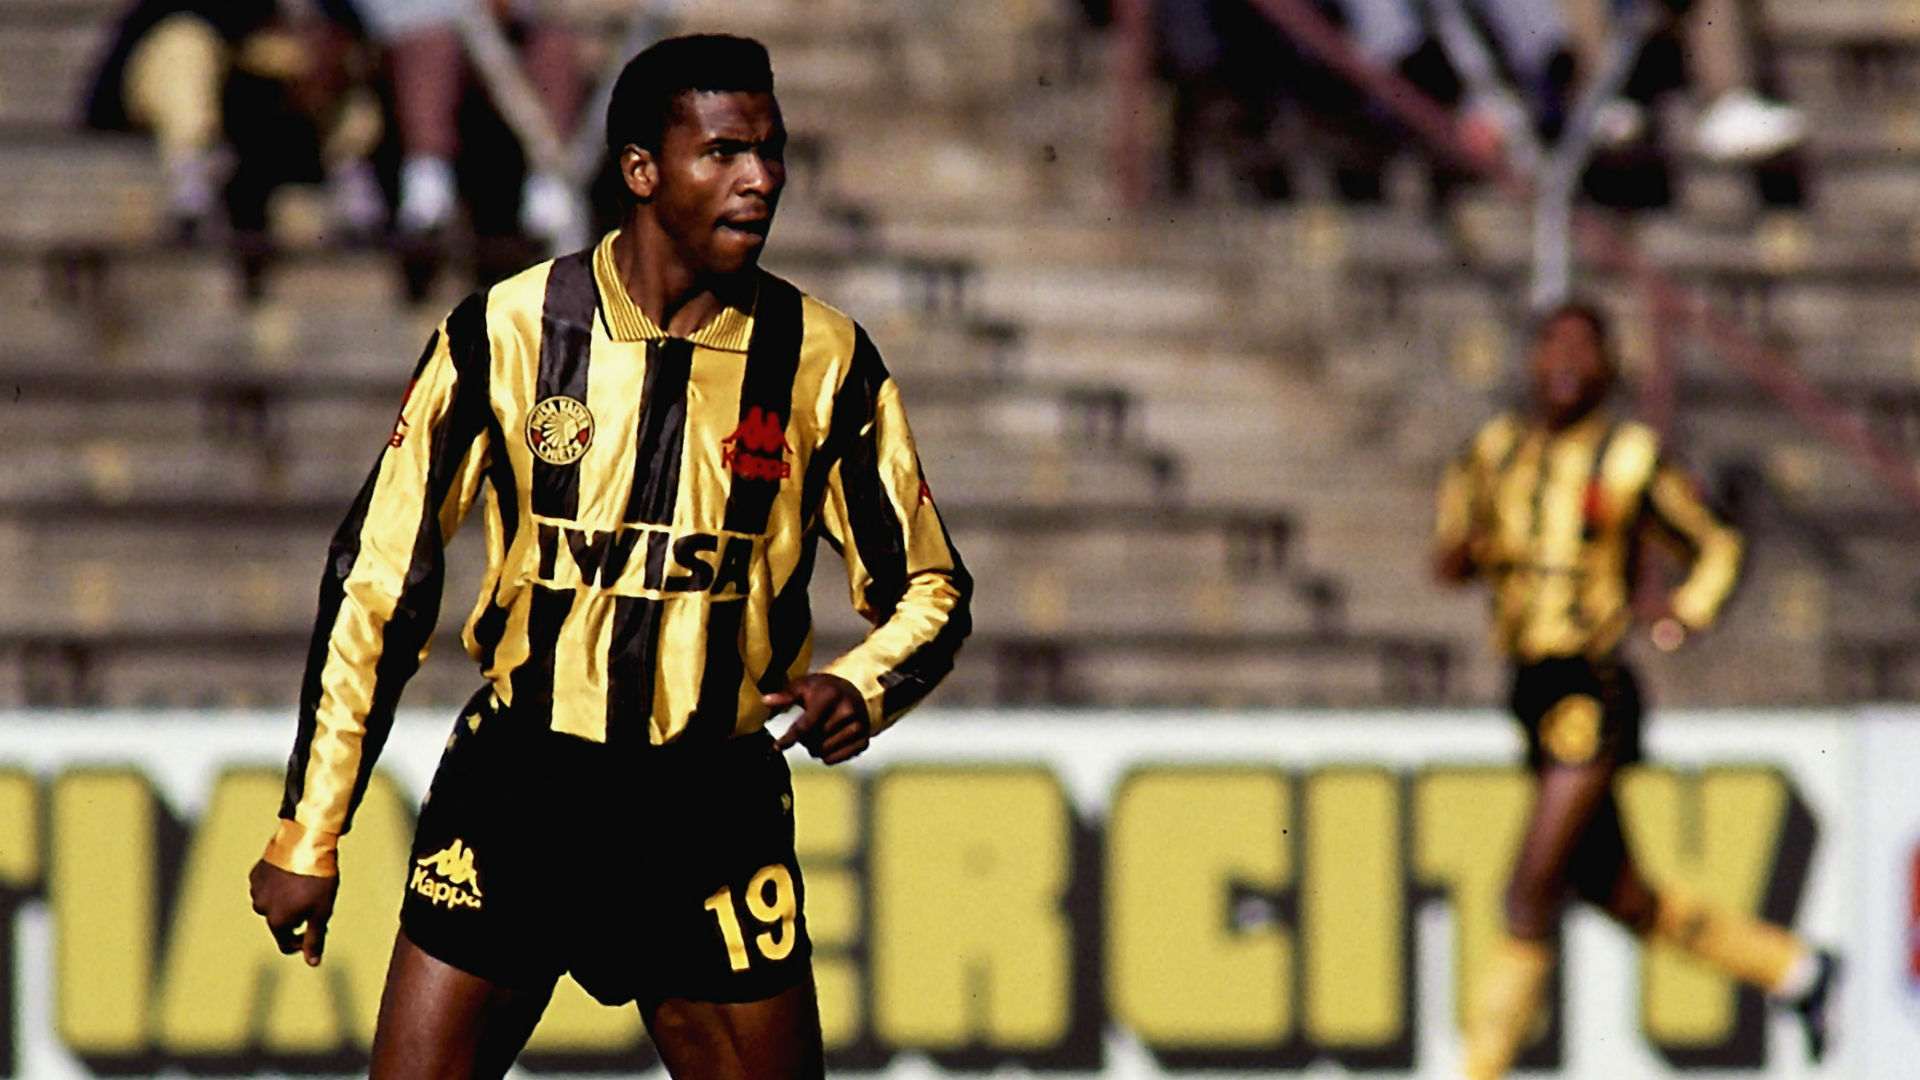 Lucas Radebe of Kaizer Chiefs